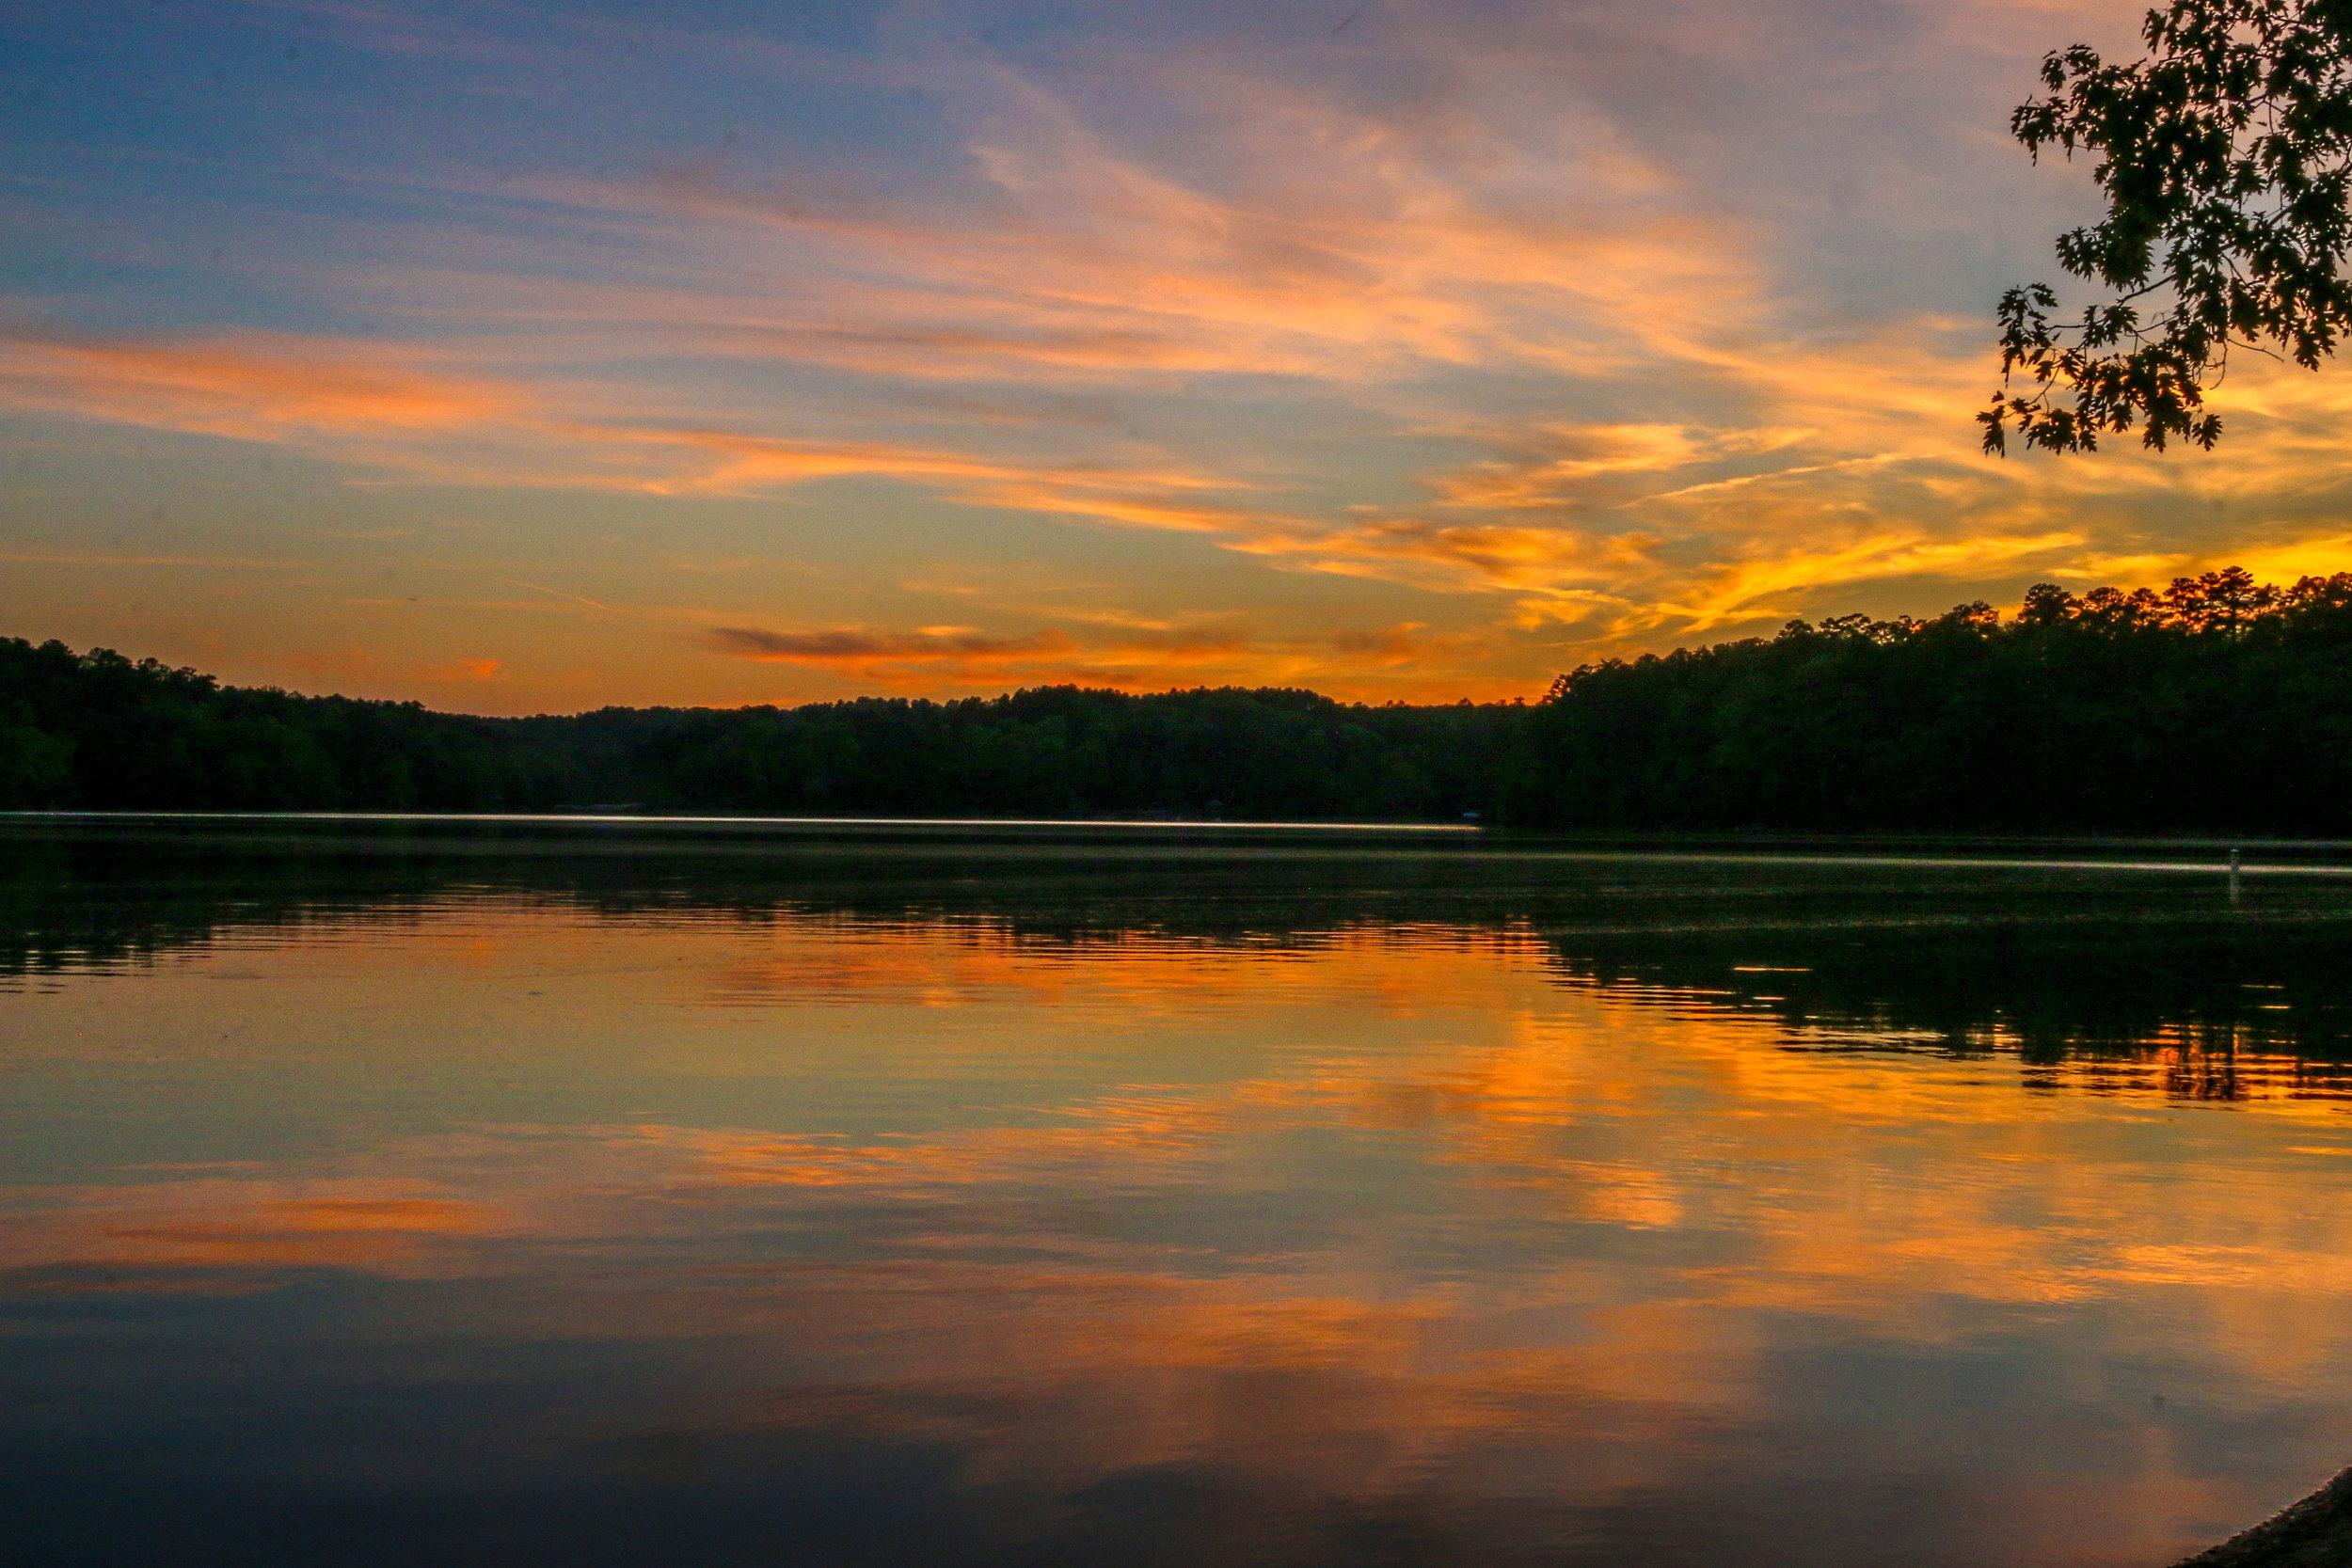 Sunset on Lake Lewis Smith